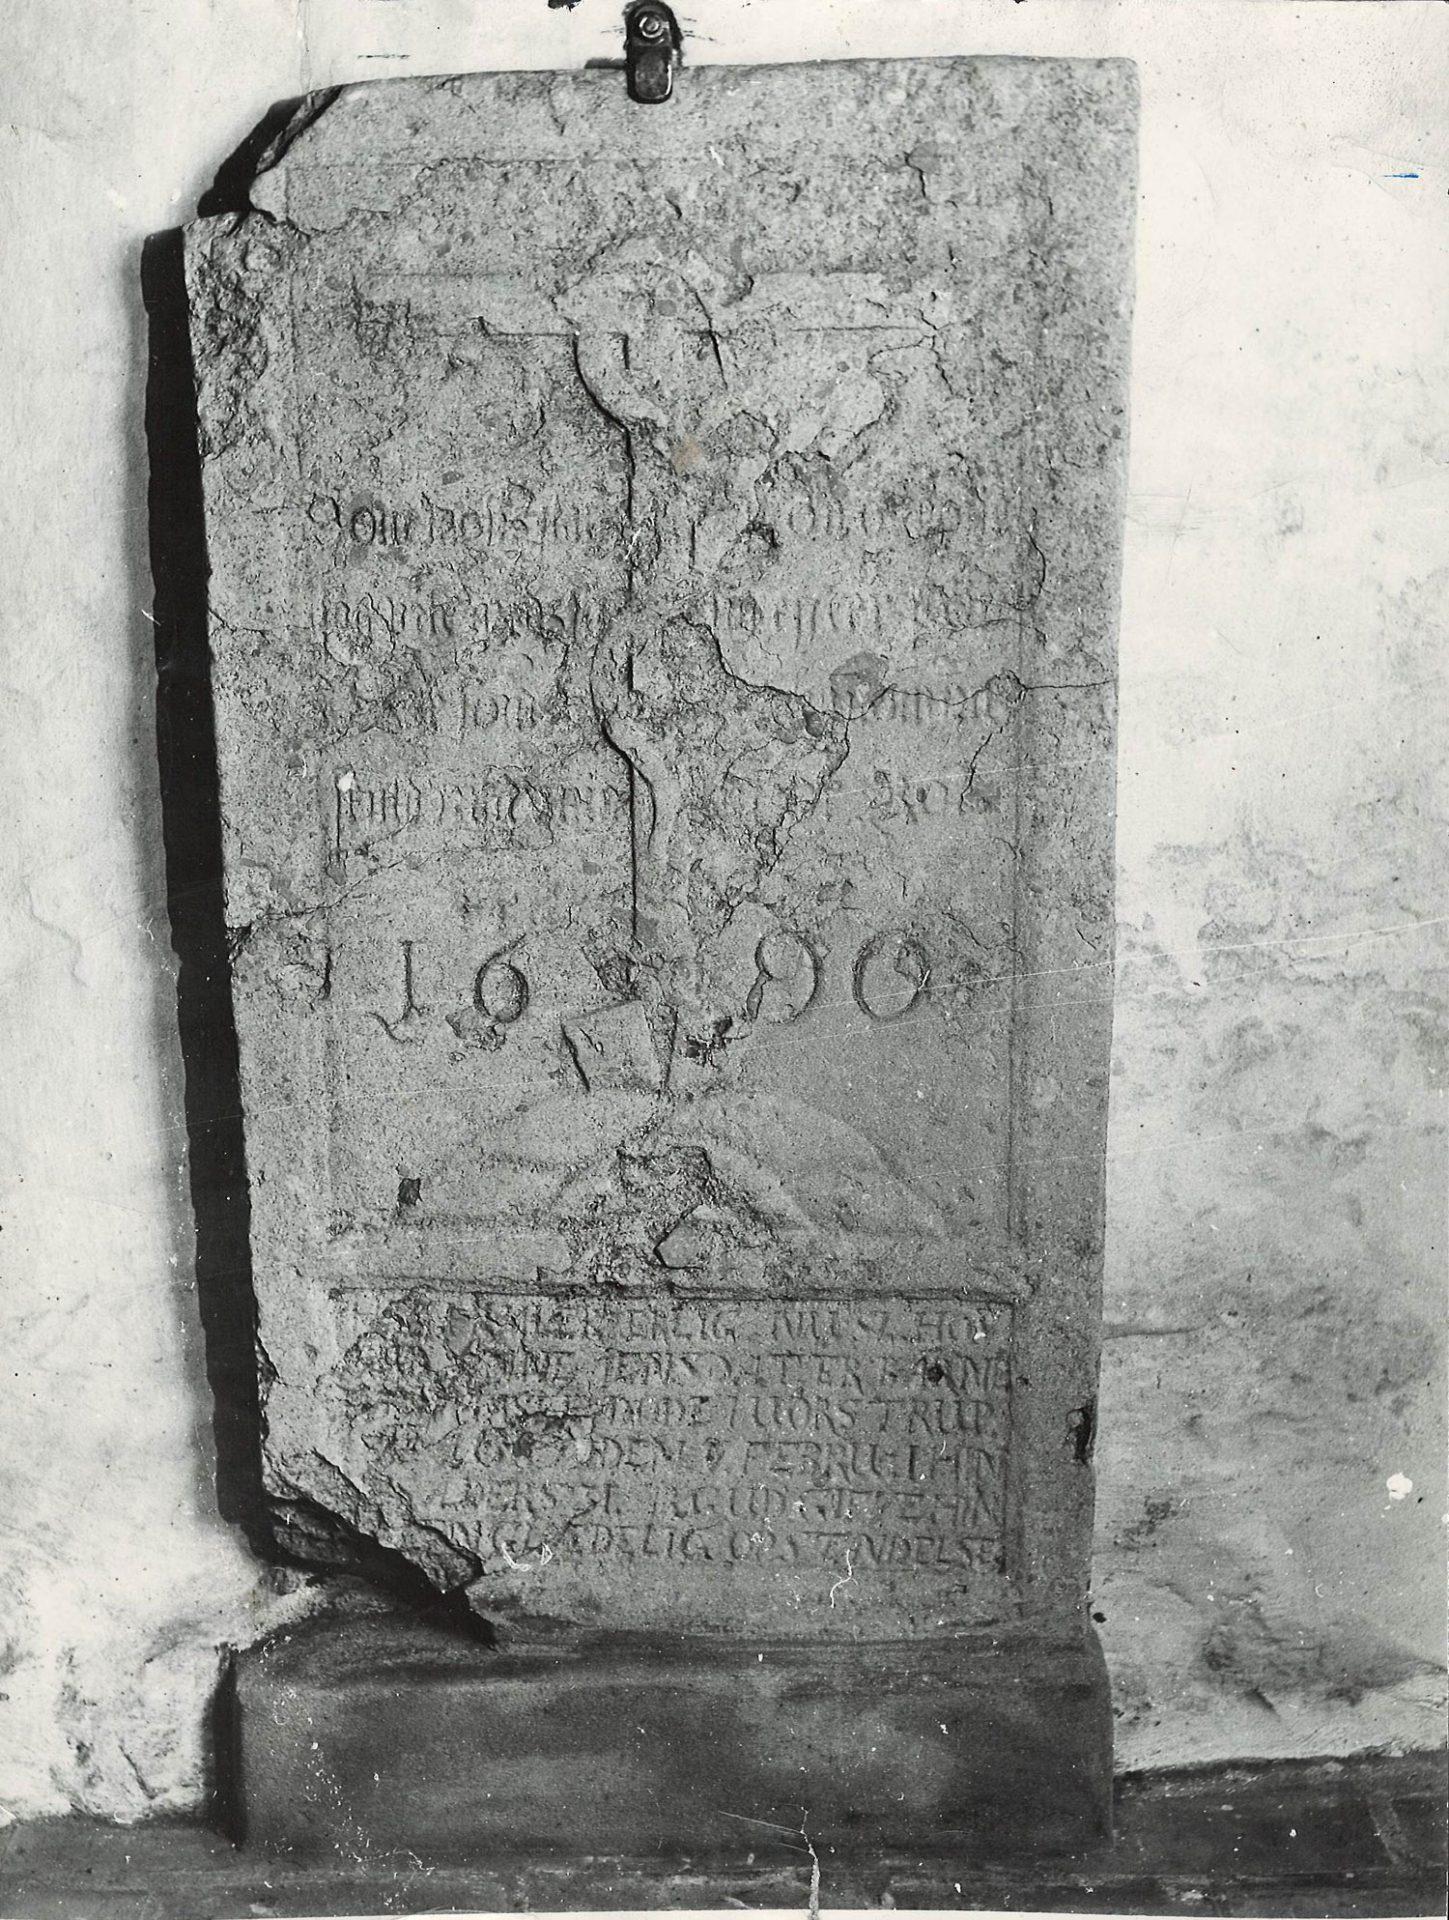 Ligsten/gravsten fra 1690. Foto 1960.